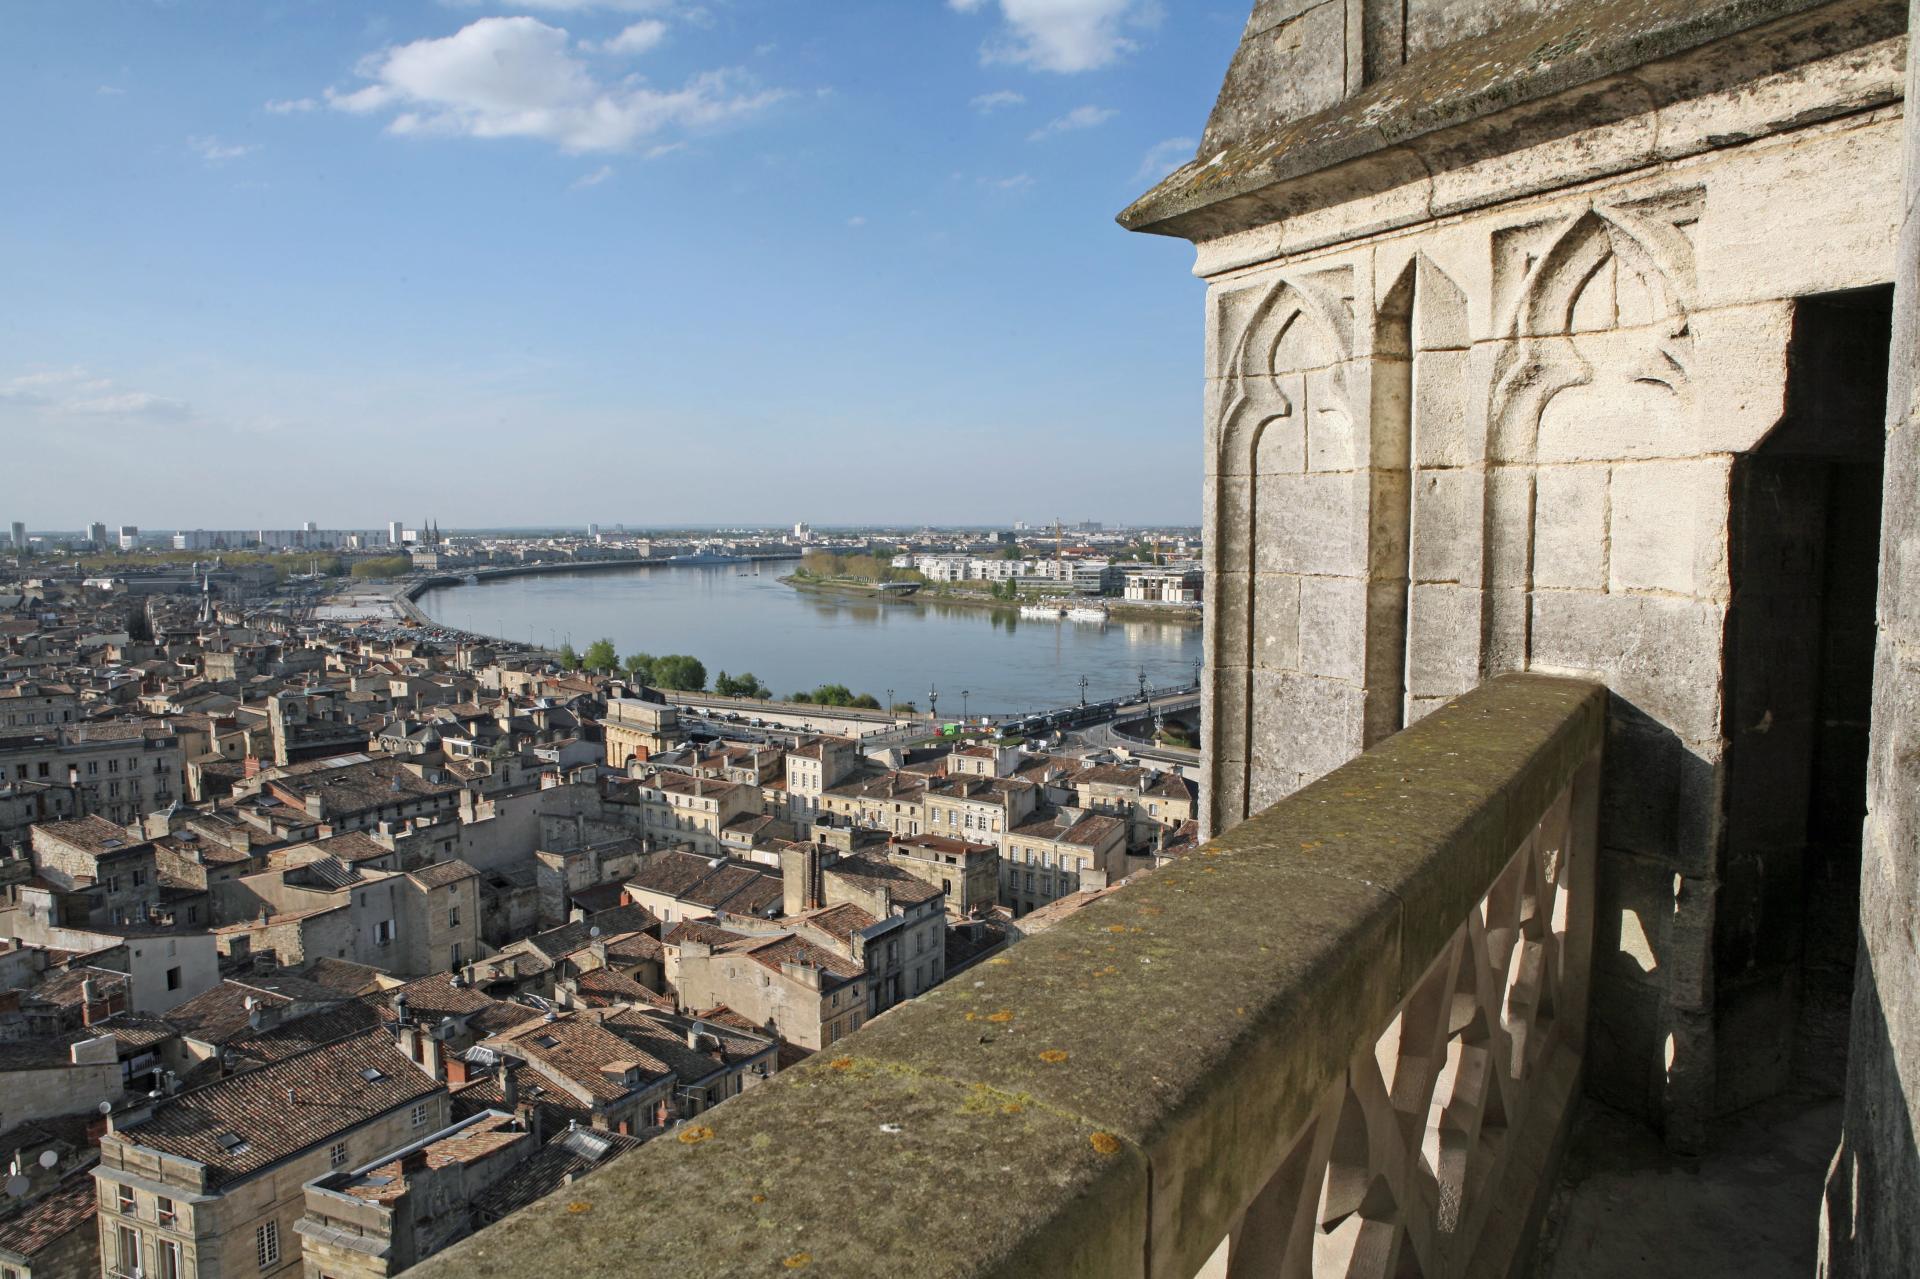 Vista da torre da Basílica de Saint Michel